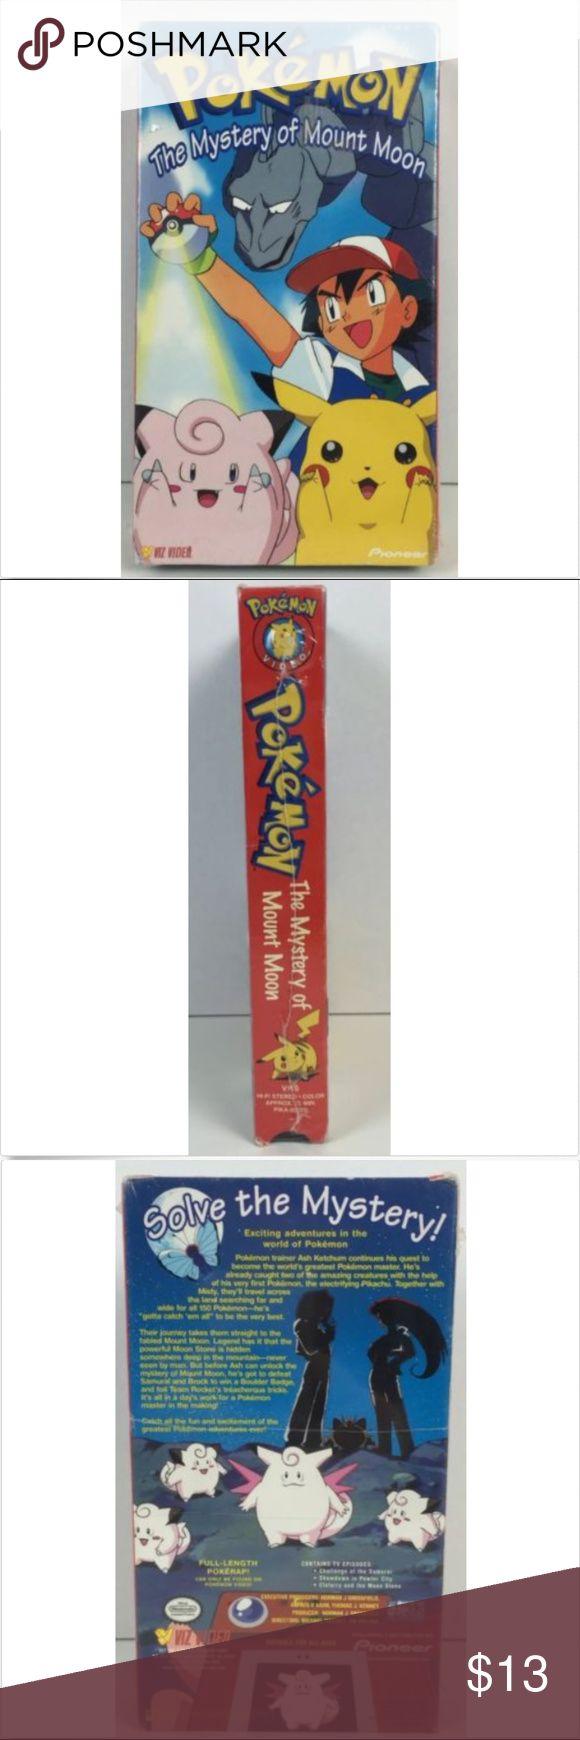 Pokemon Vol 2 The Mystery Of Mount Moon VHS, 1999 Factory Sealed Pokemon Vol. 2: The Mystery Of Mount Moon (VHS, 1999) Pokemon Other